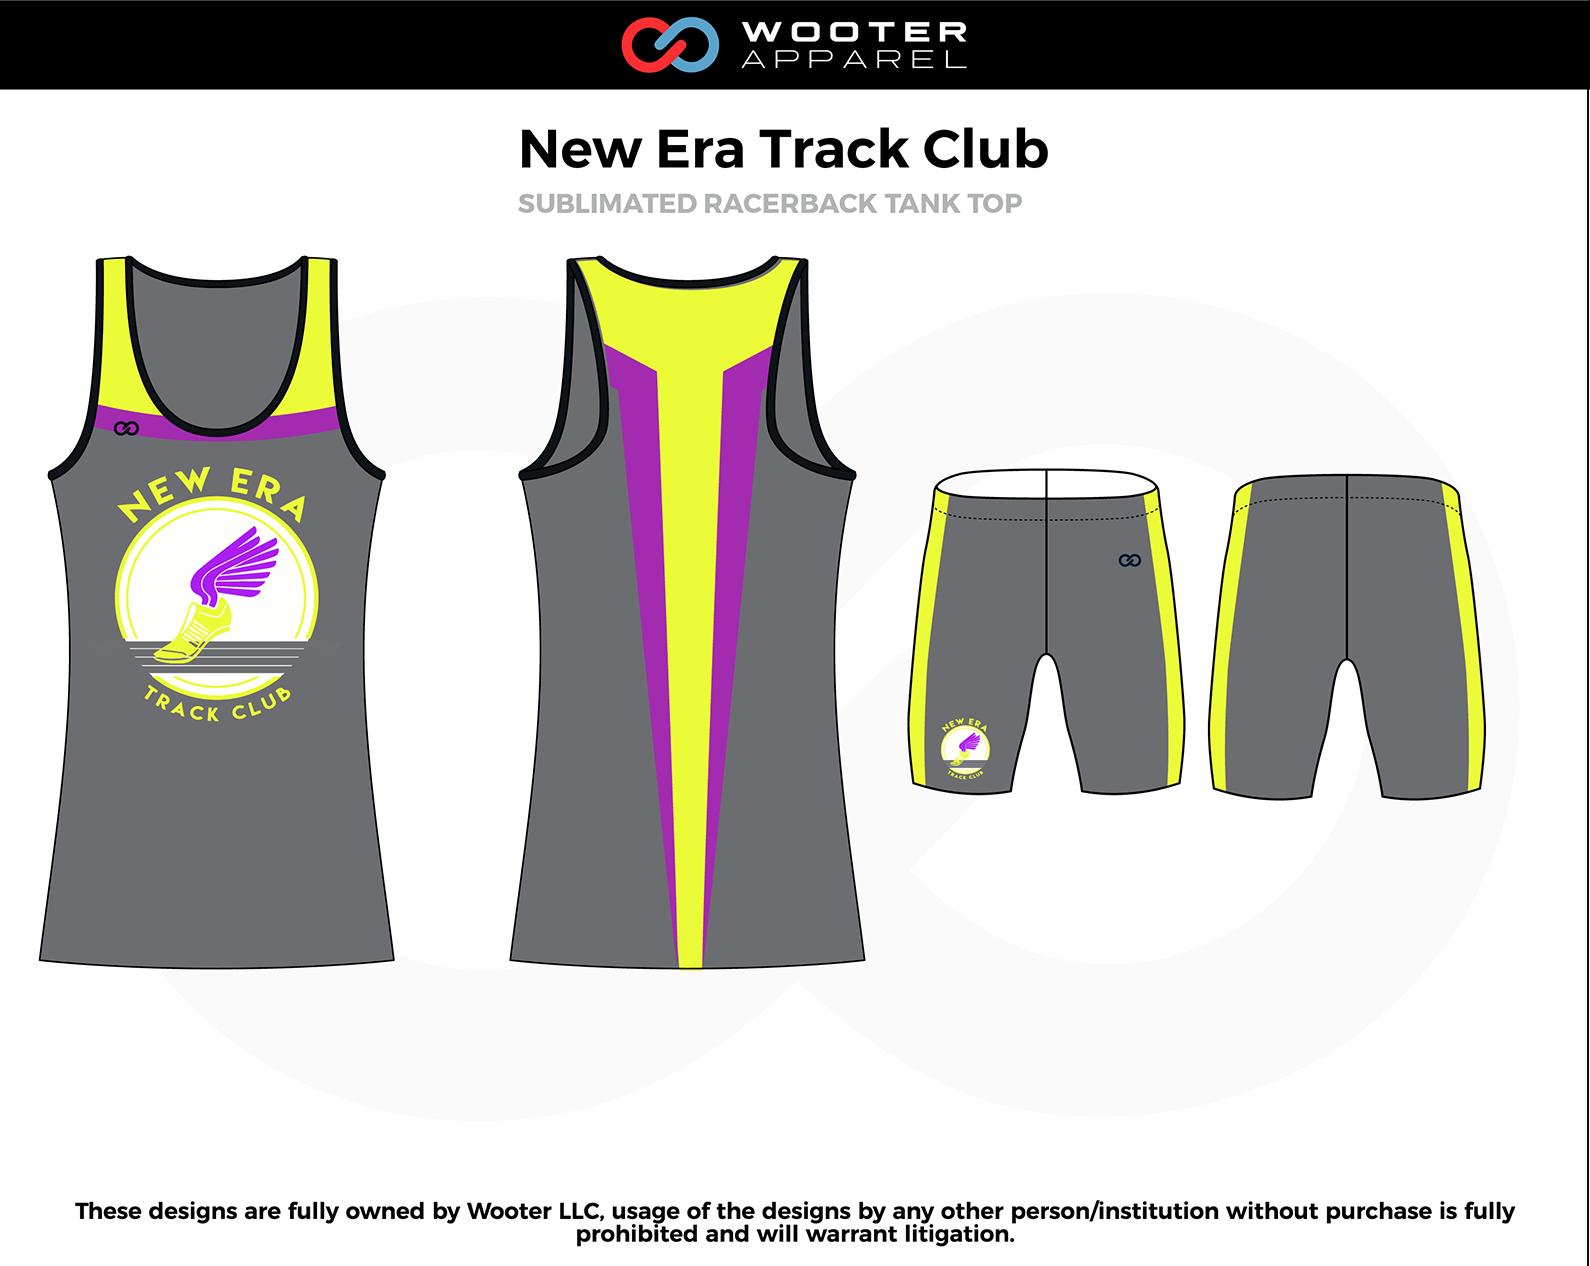 New era track club_compression_shirt v4-01.png